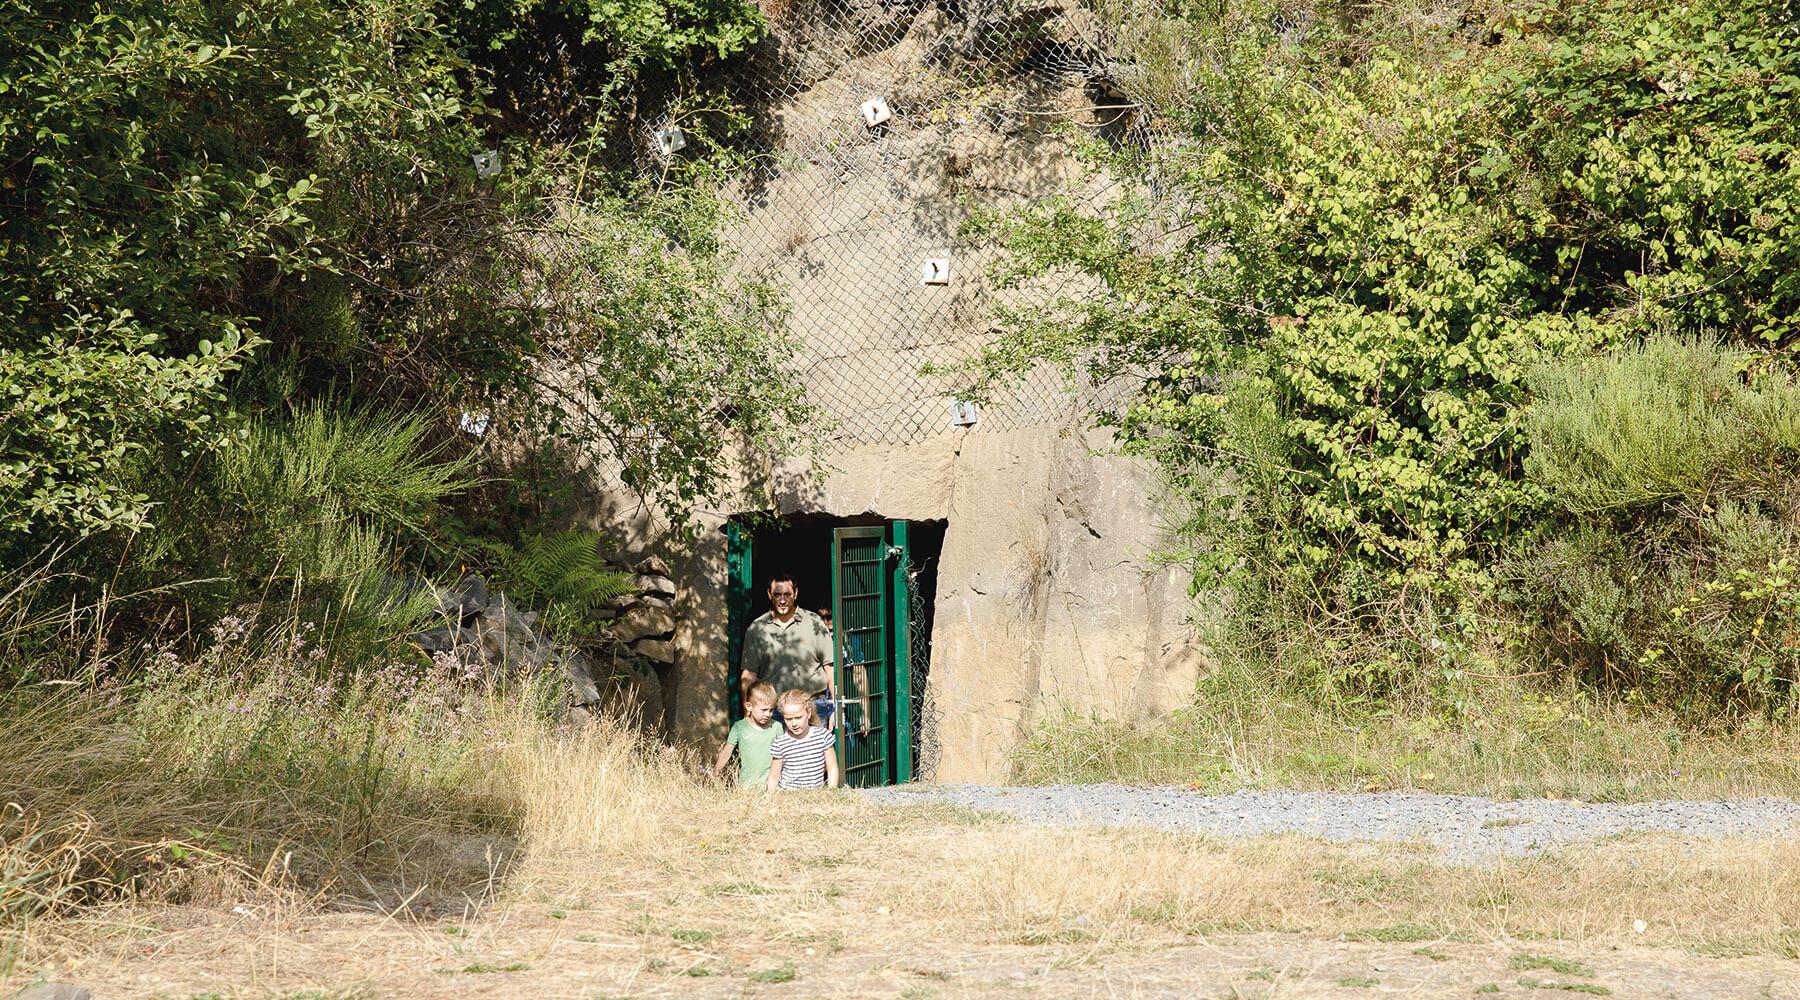 Vulkanpark Mayener Grubenfeld Drei Personen verlassen den Schacht 700 im Mayener Grubenfeld